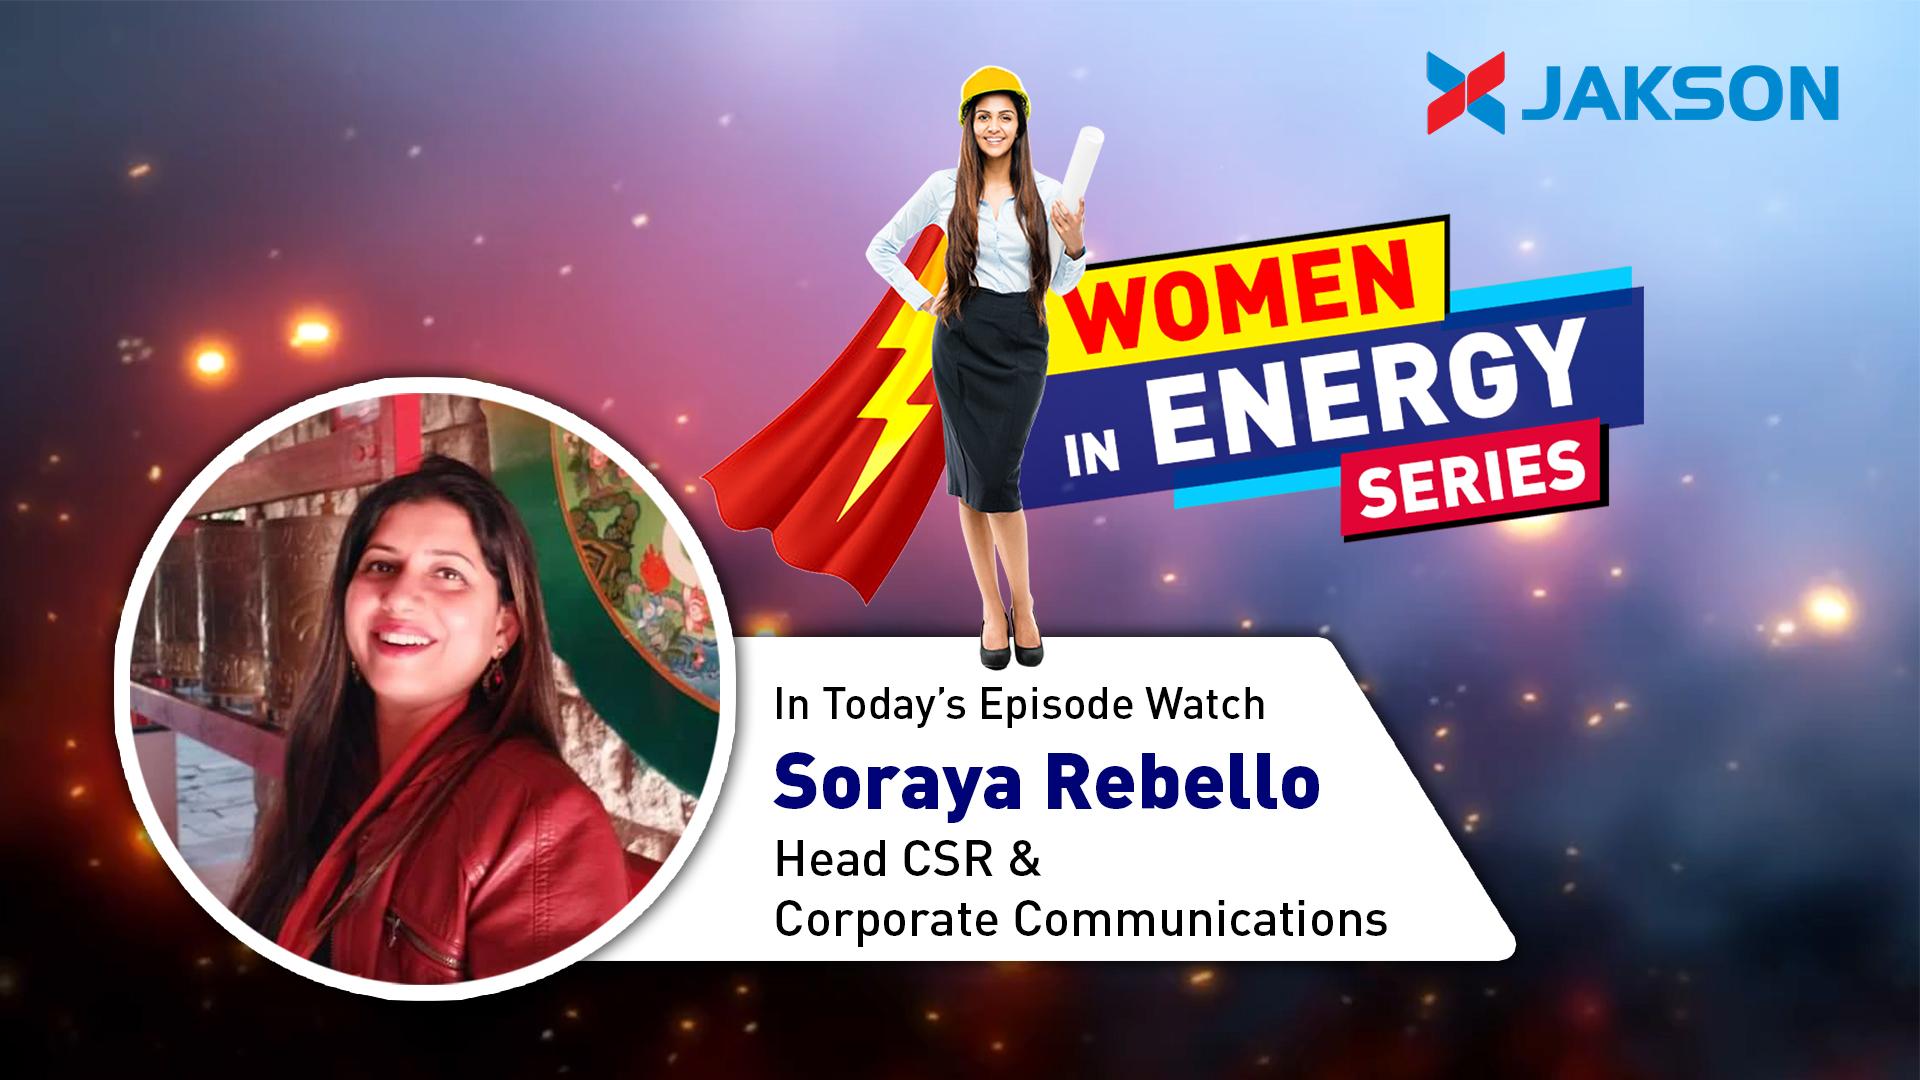 Women in Energy - Episode 2 - Watch Ms. Soraya Rebello - Head CSR & Corporate Communications